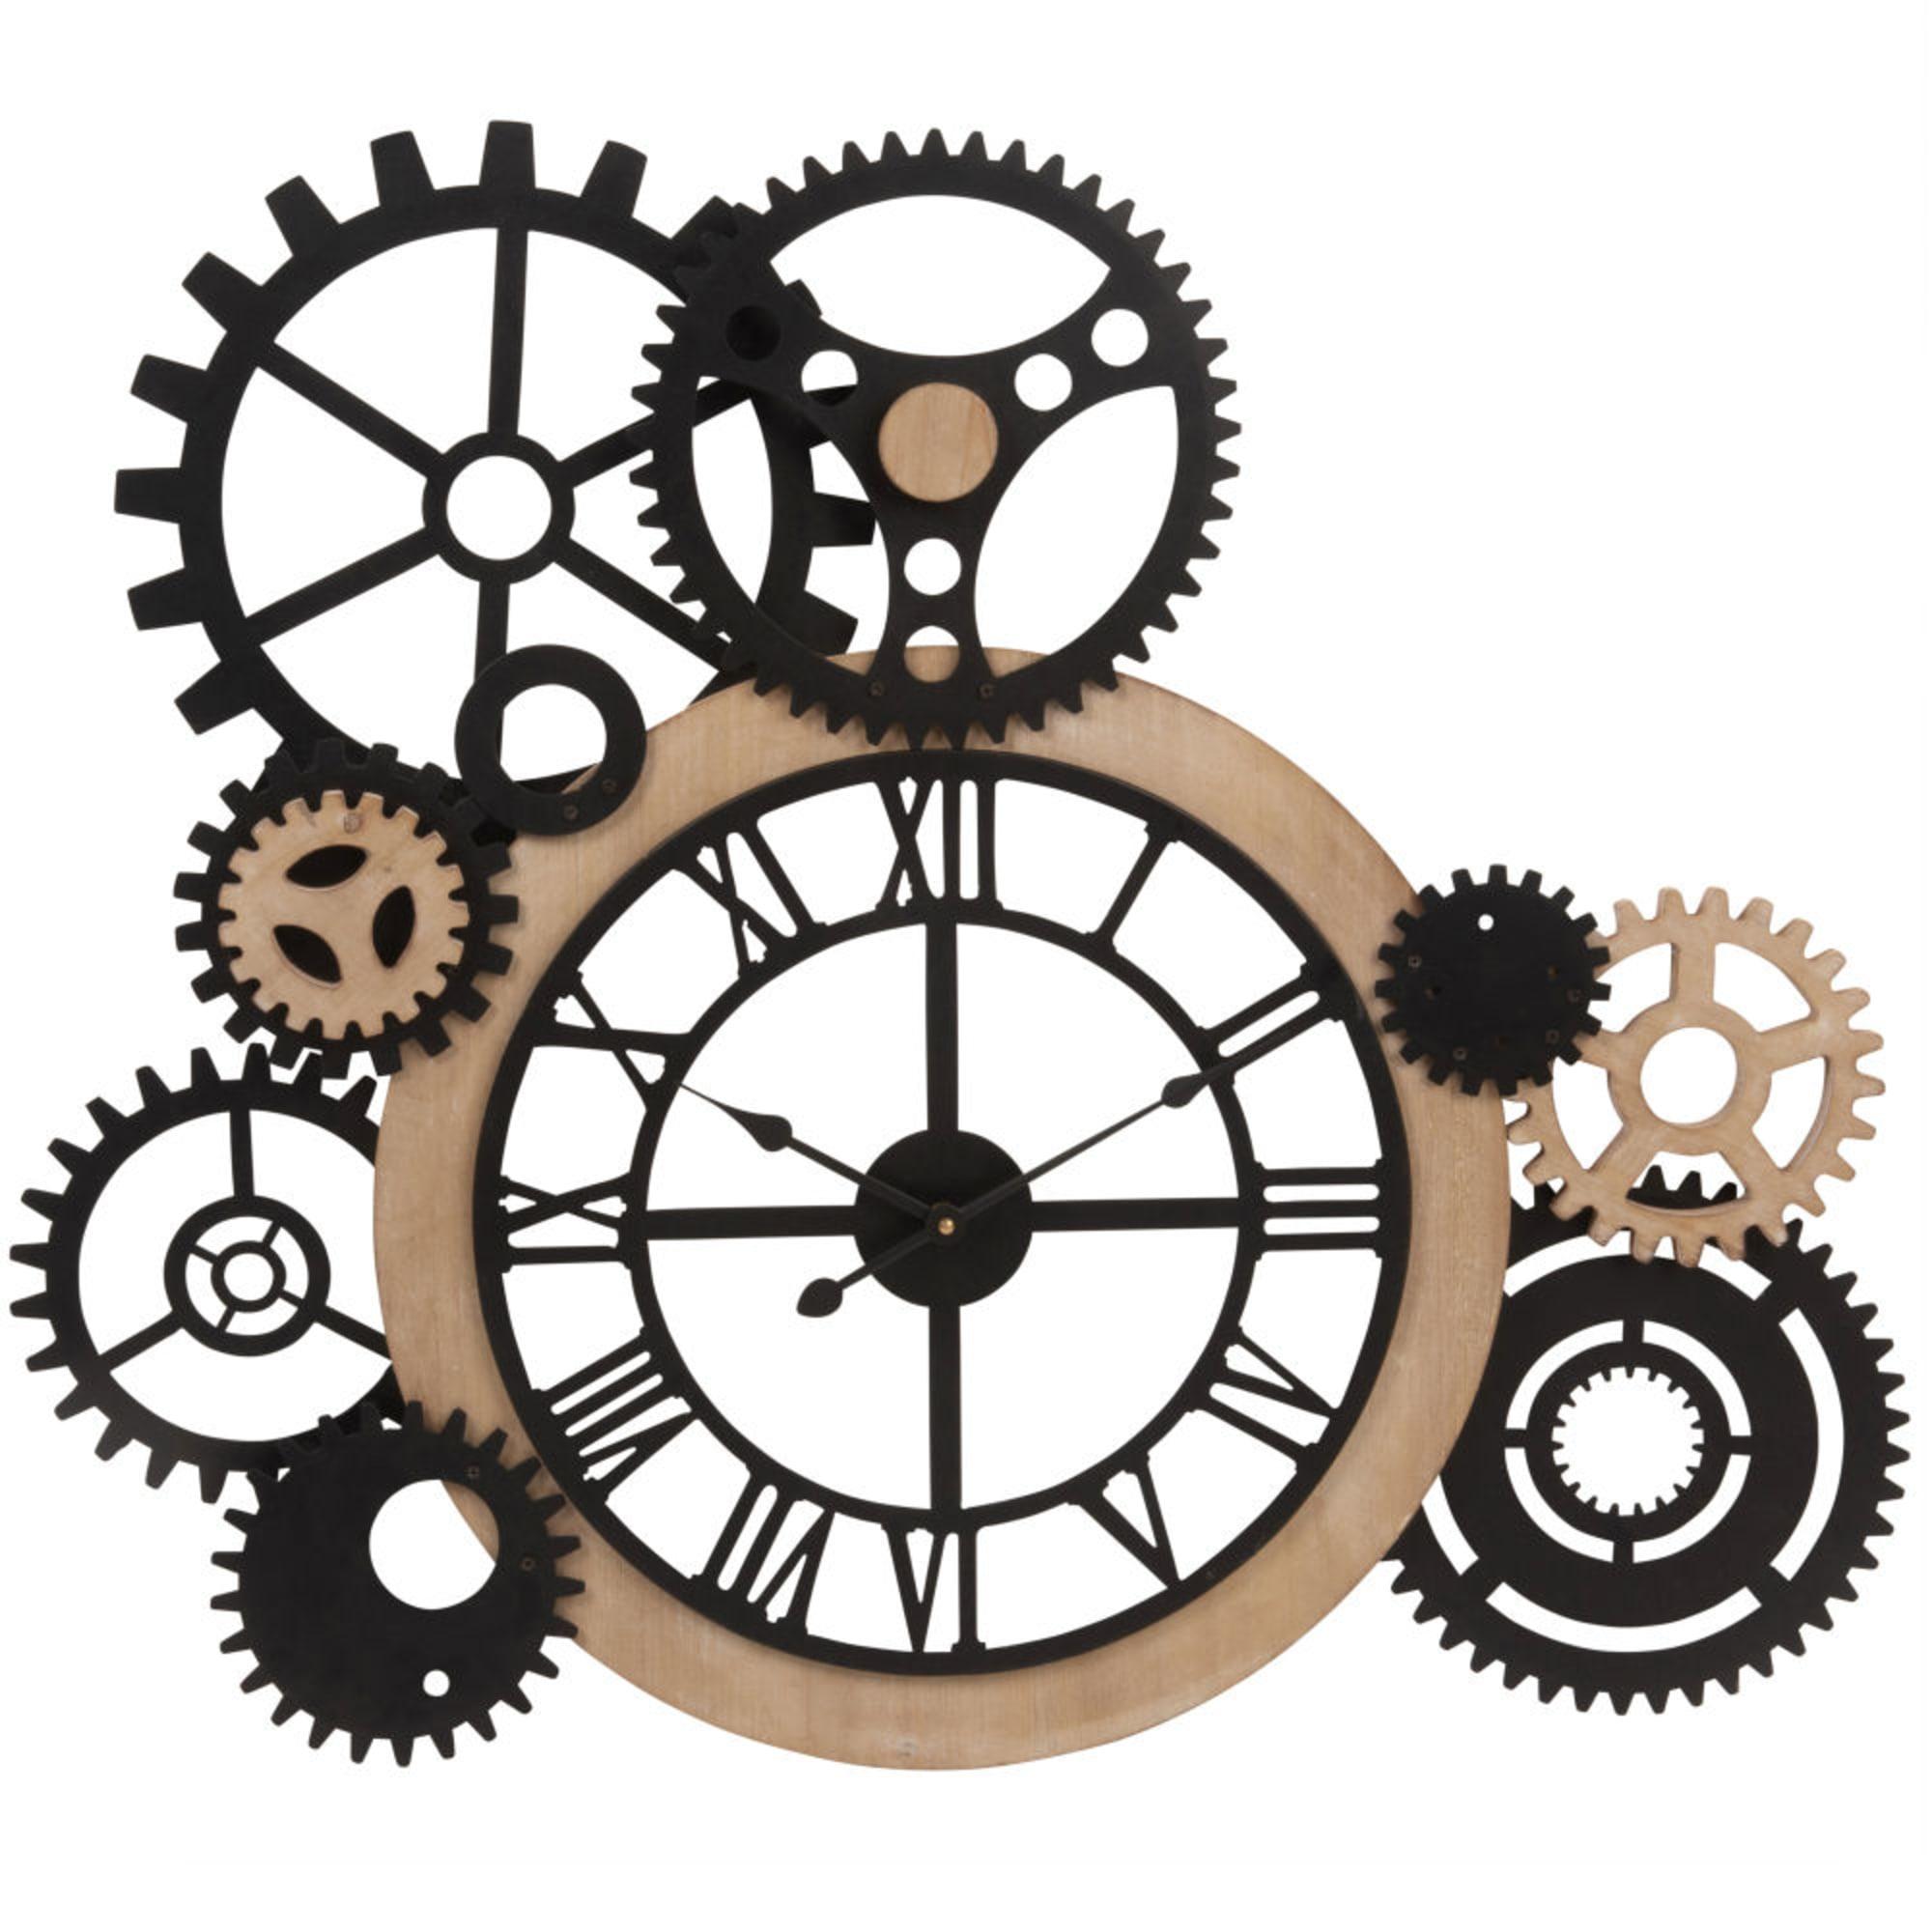 Ajuster vos horloges avec la rentrée